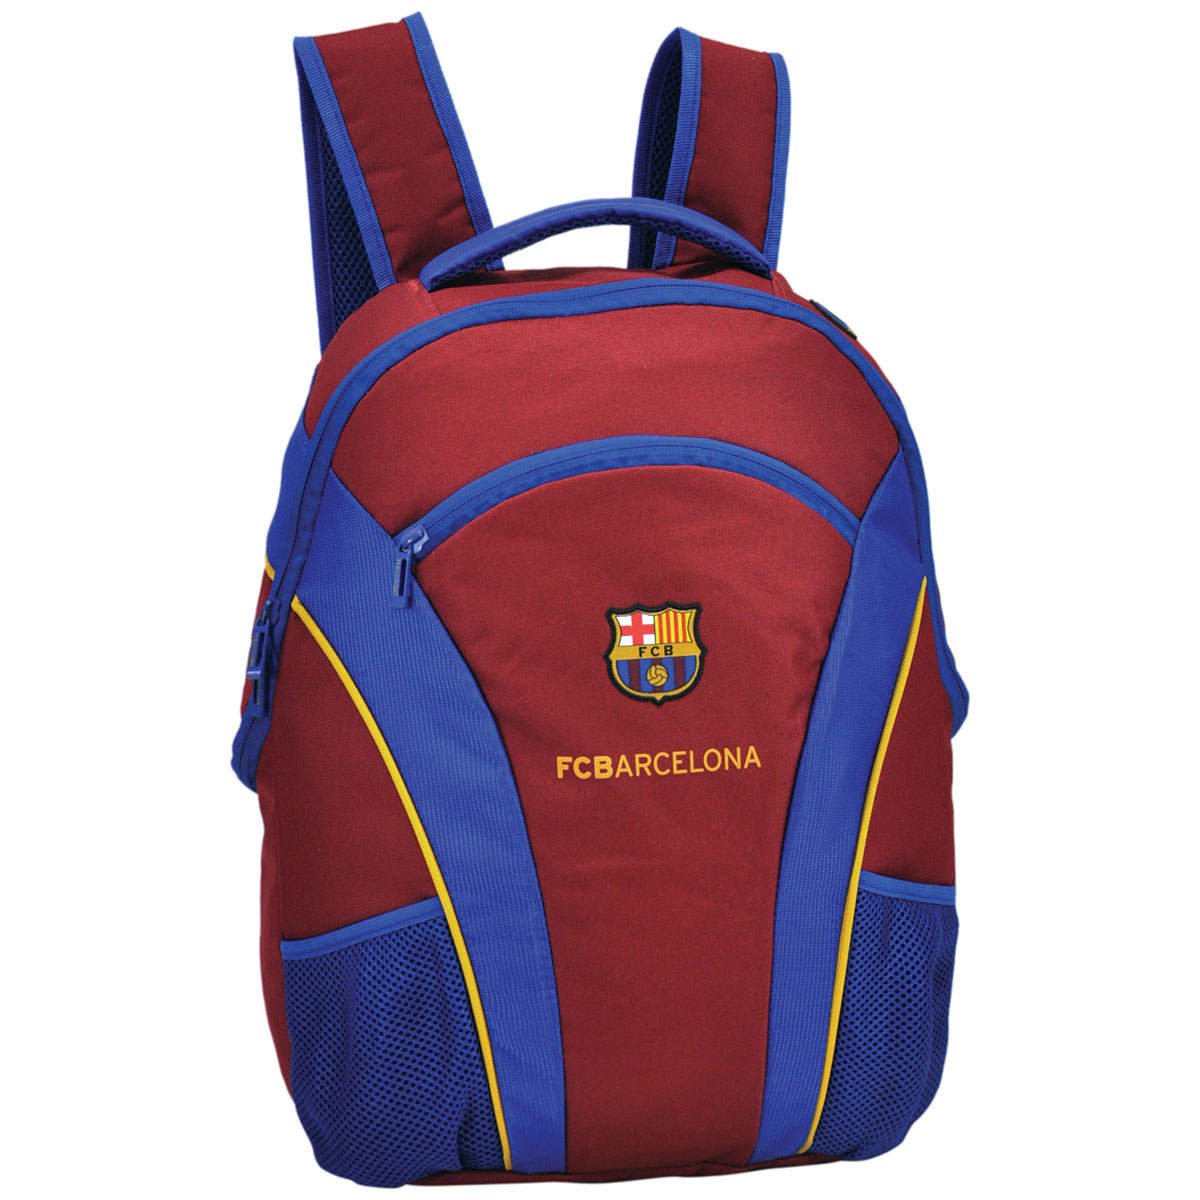 Mochila Barcelona Camp Nou 4035 - Xeryus